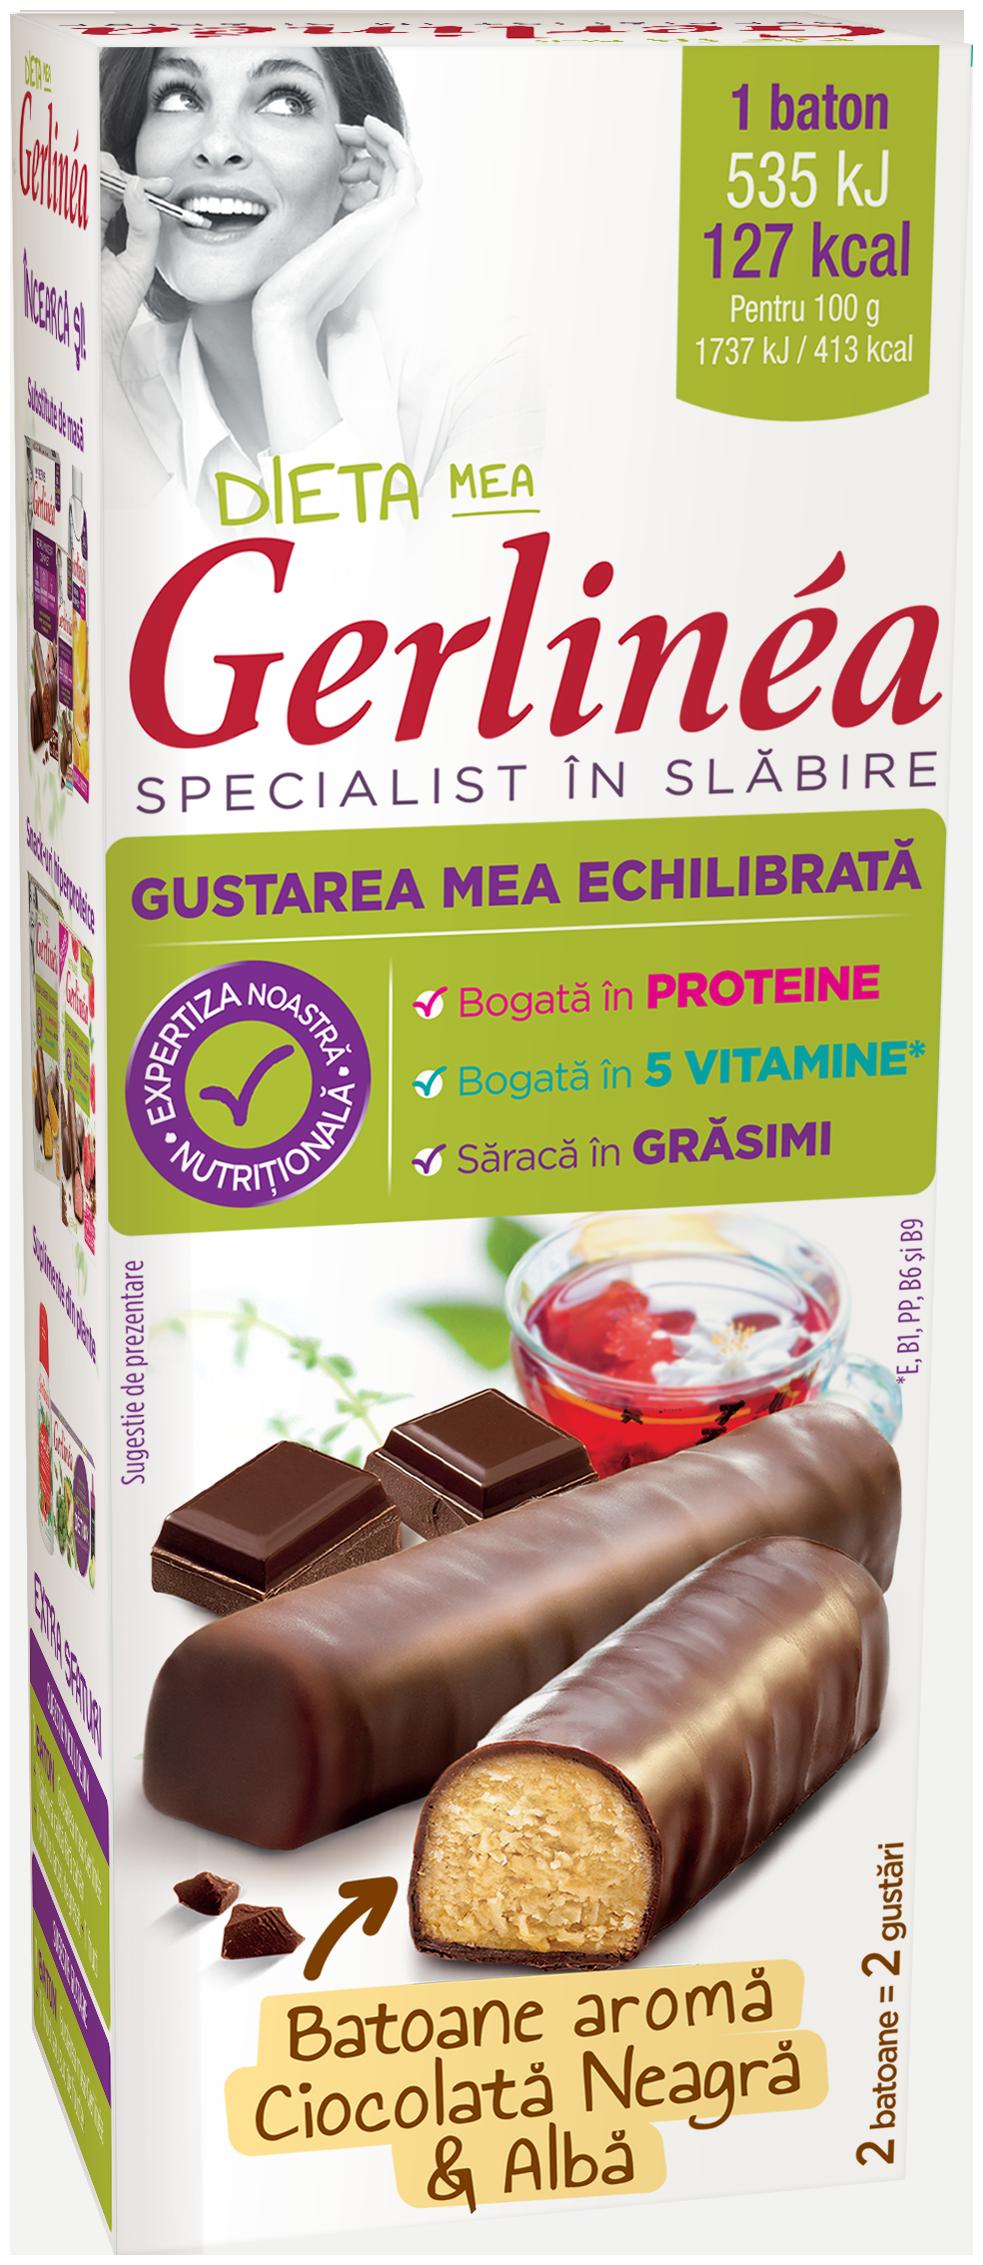 Gerlinea-bipack-Batoane-Ciocolata-Neagra-Alba-SUMMER-2018-3D